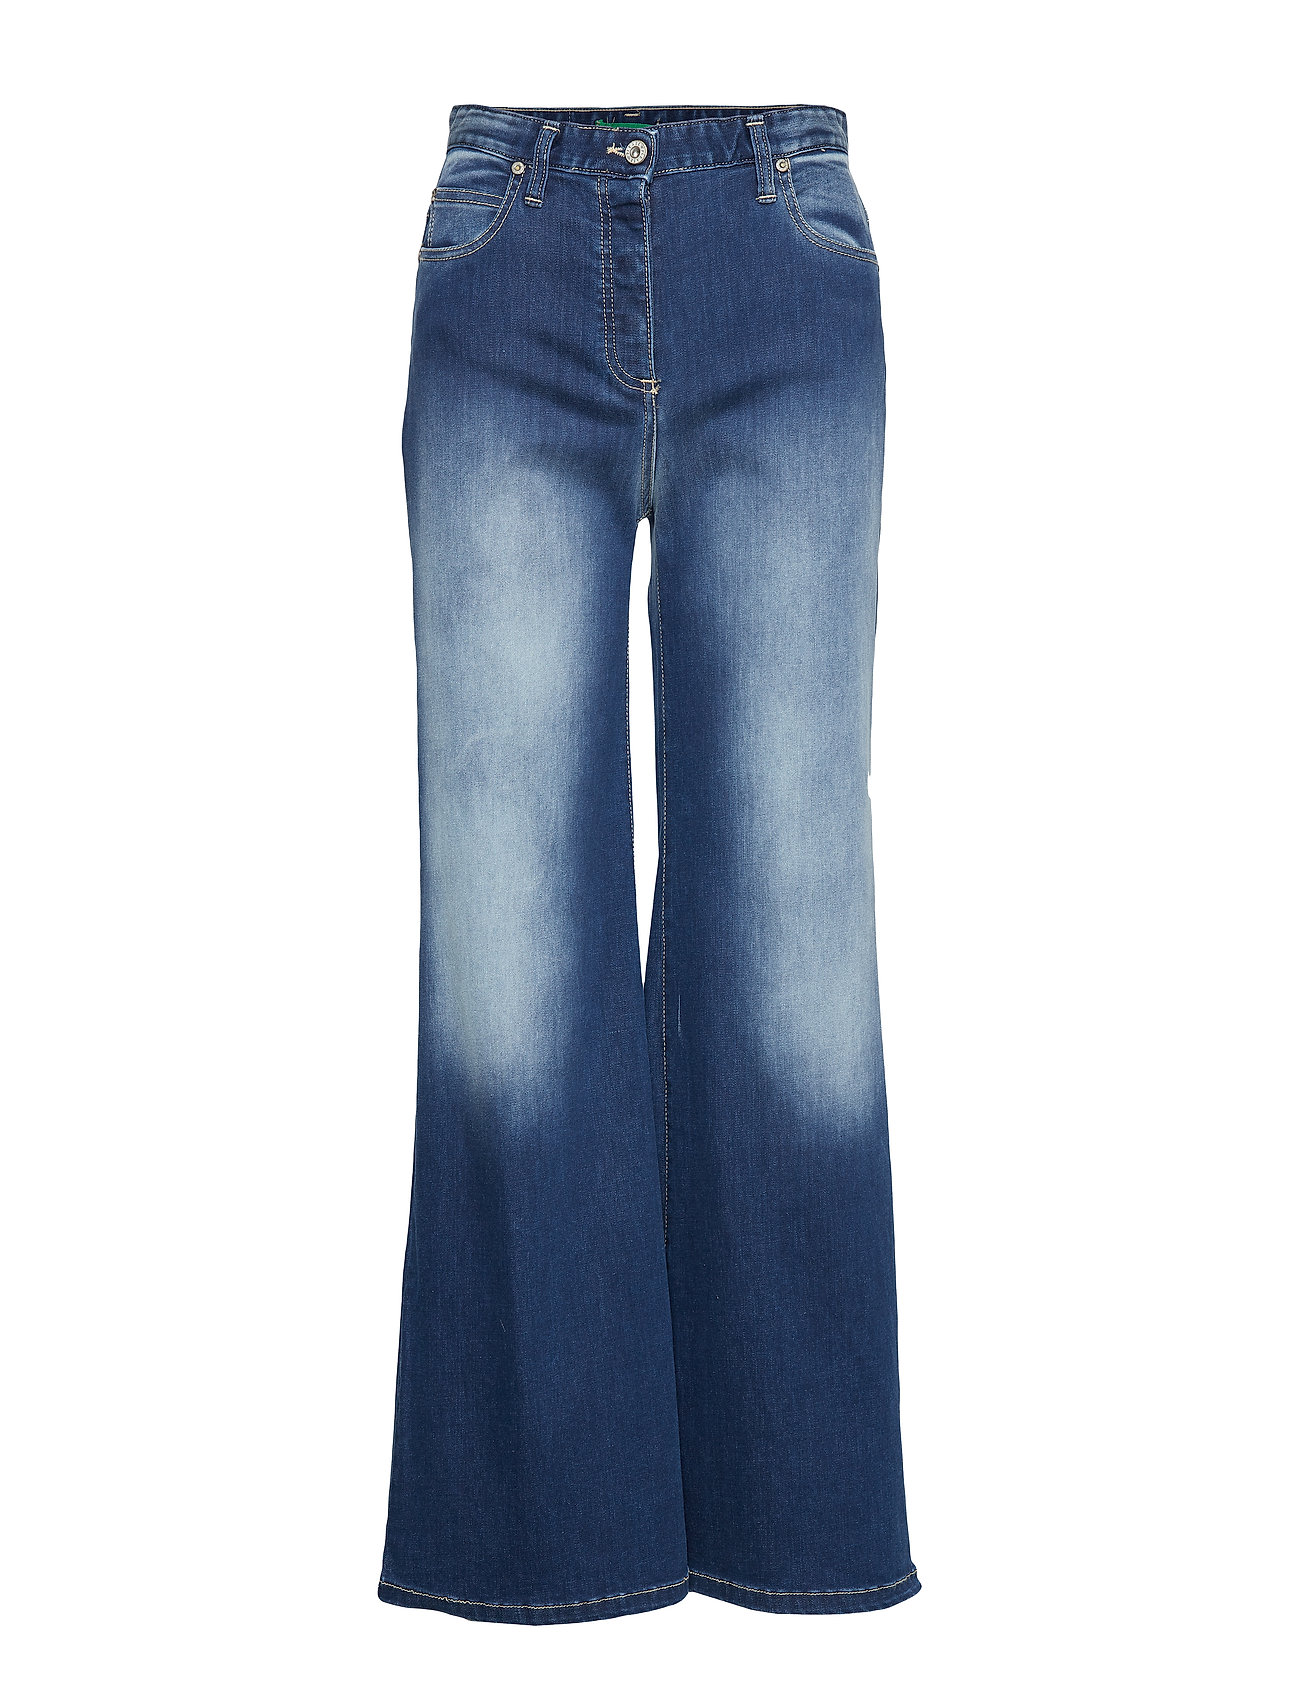 Please Jeans WIDE LEG STOCKHOLM - BLU DENIM